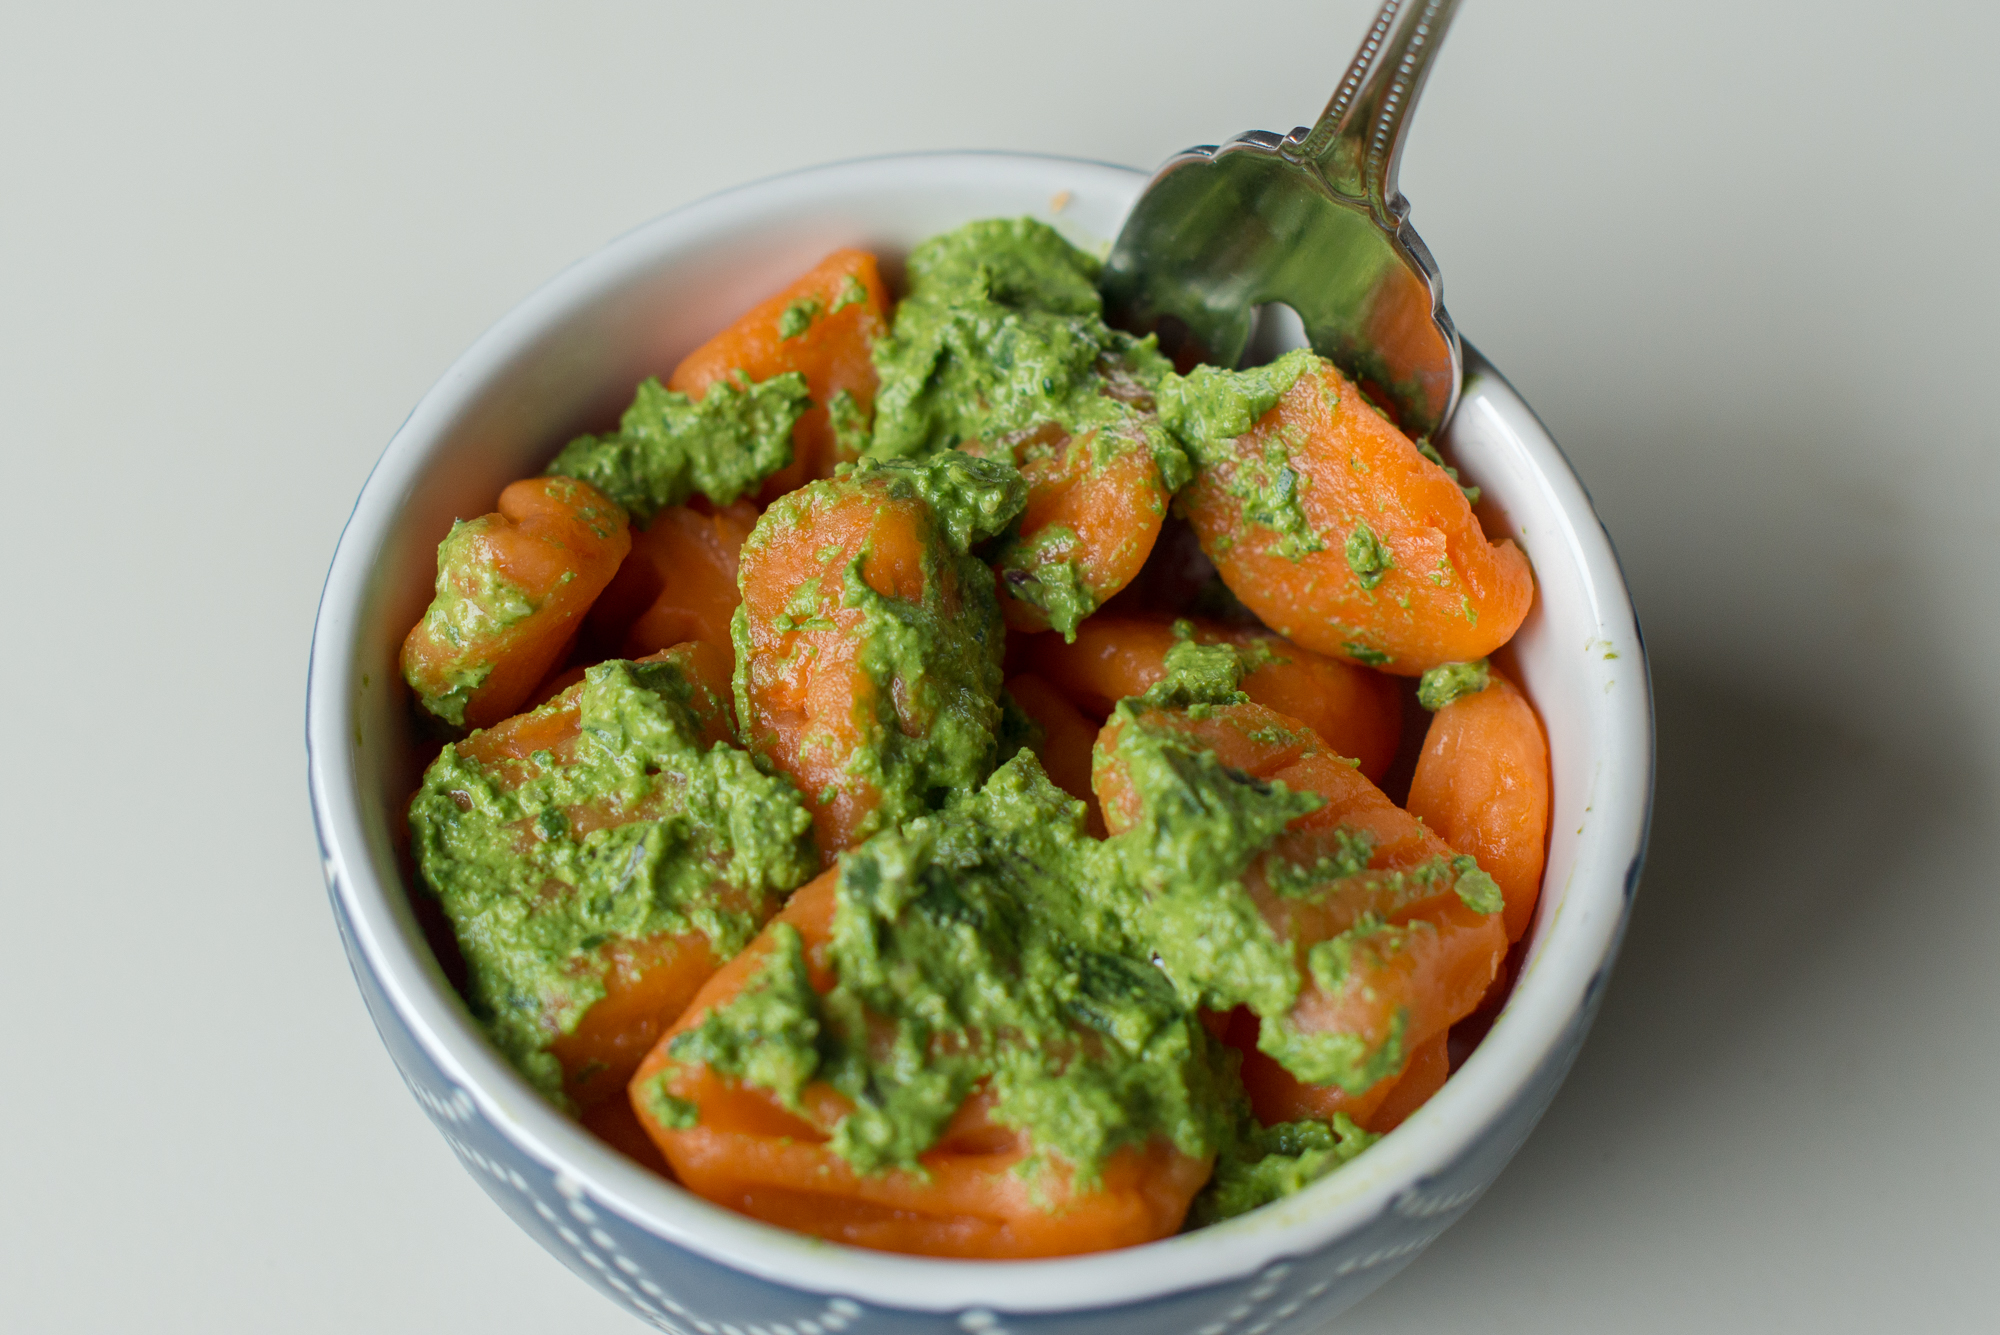 Sweet Potato Gnocchi (gluten free, dairy free)